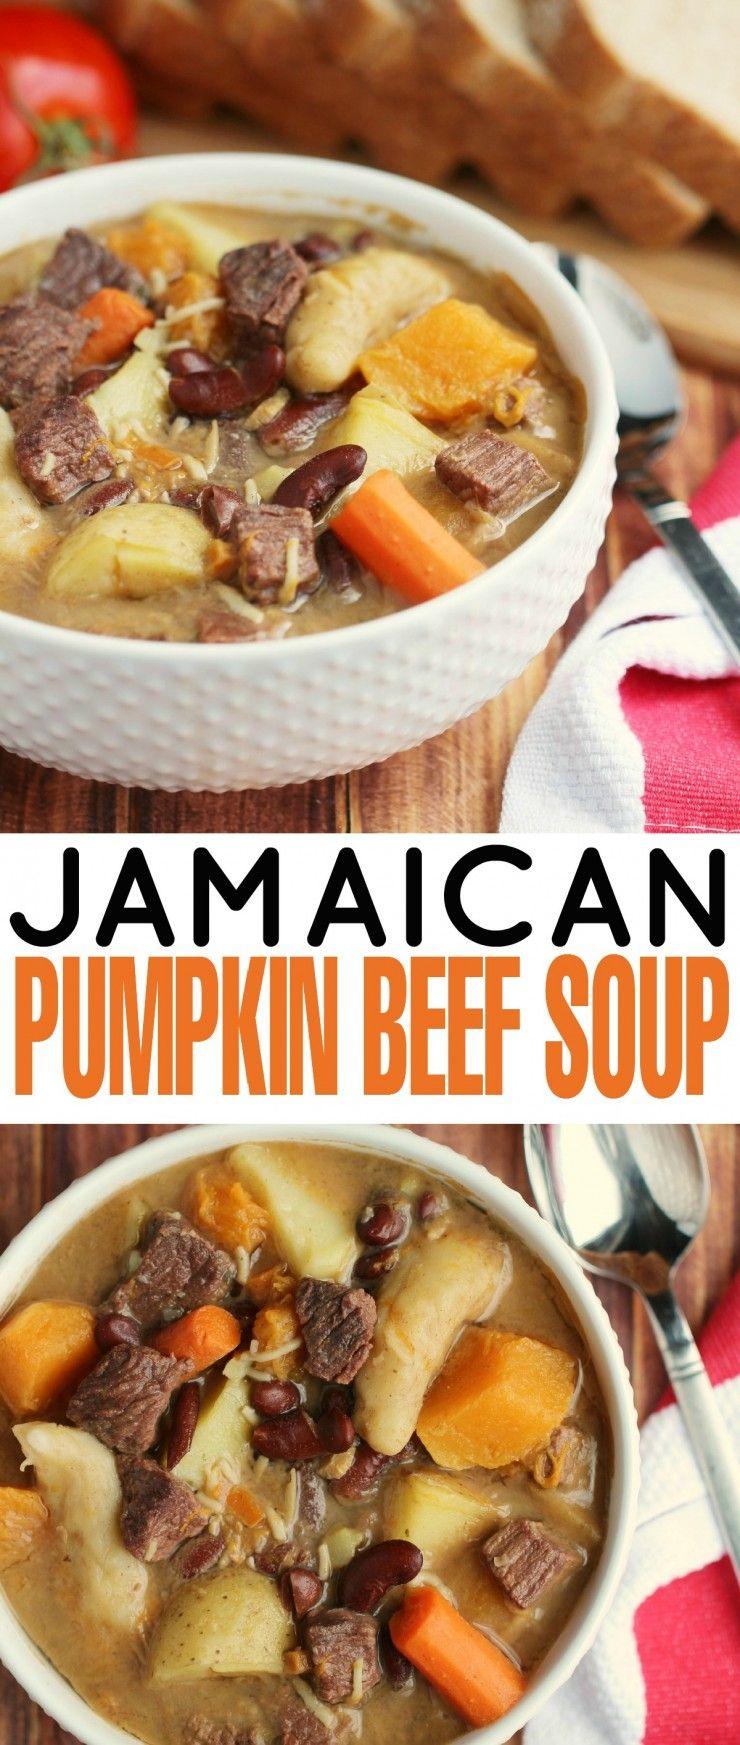 jamaican pumpkin beef soup  recipe  indian food recipes